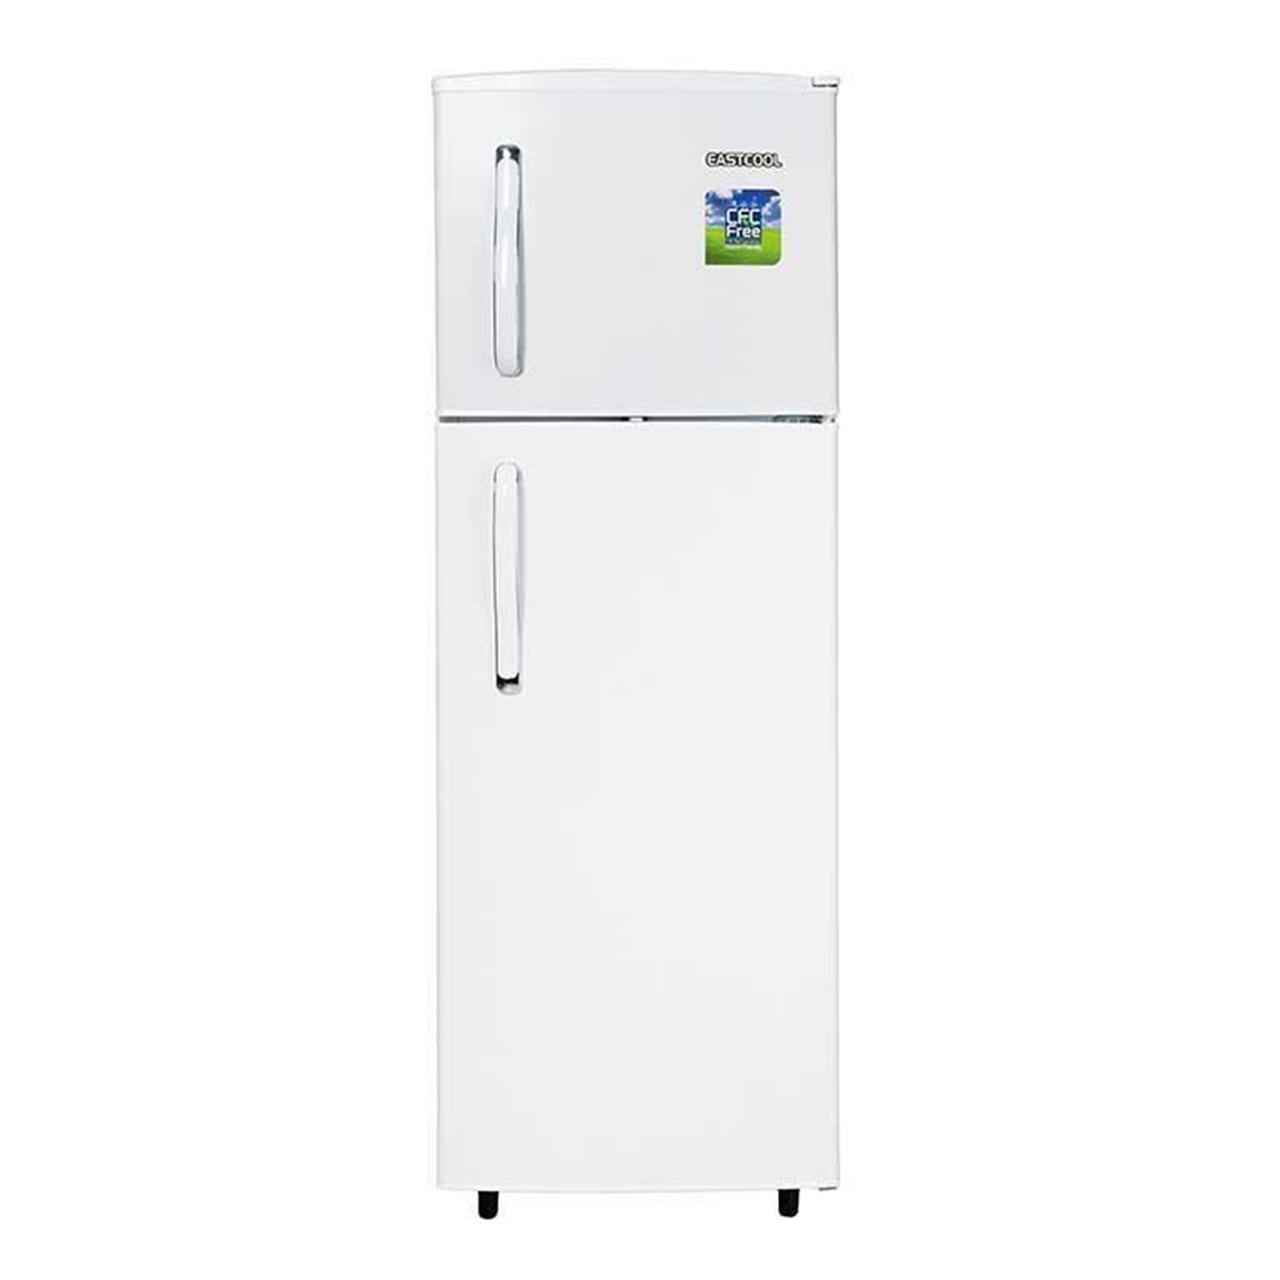 فروش نقدی یا اقساطی یخچال ایستکول مدل TM-96200